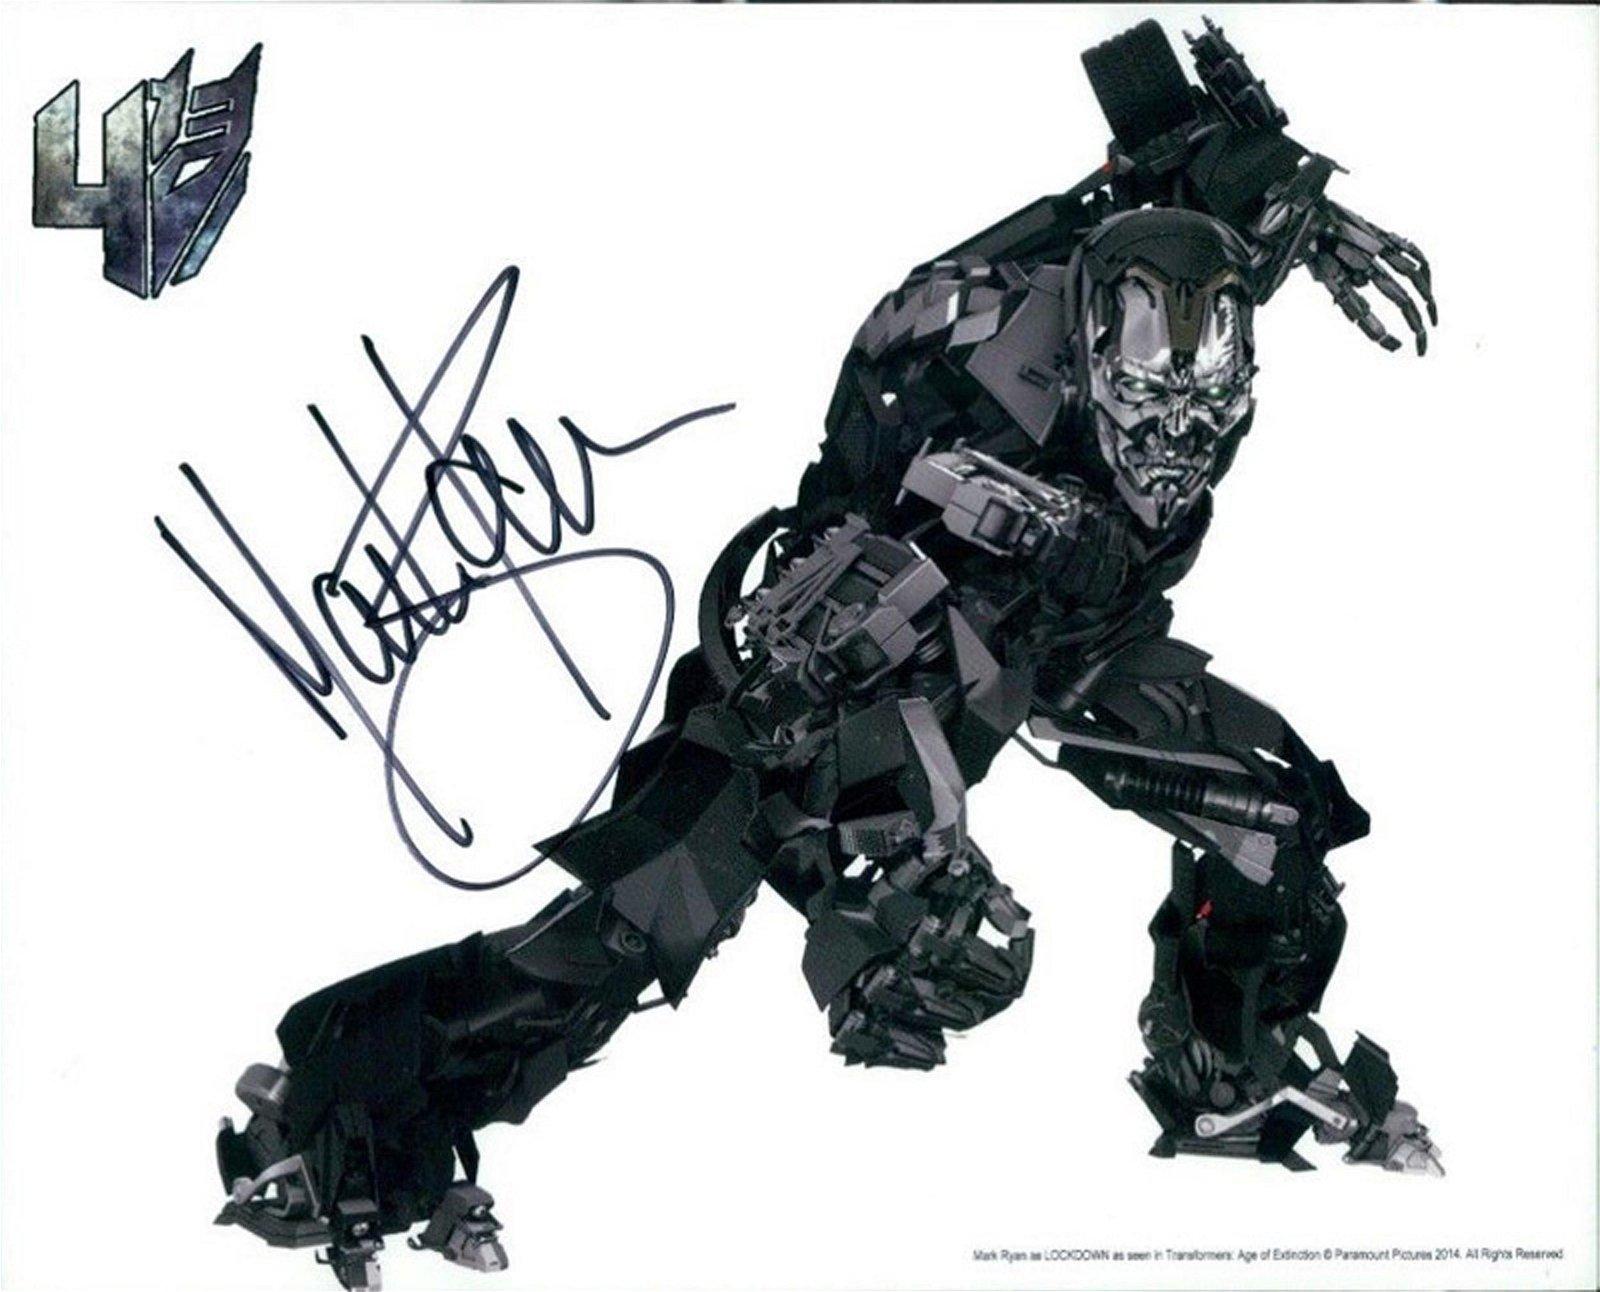 Blowout Sale! Transformers Matt Ryan hand signed 10x8